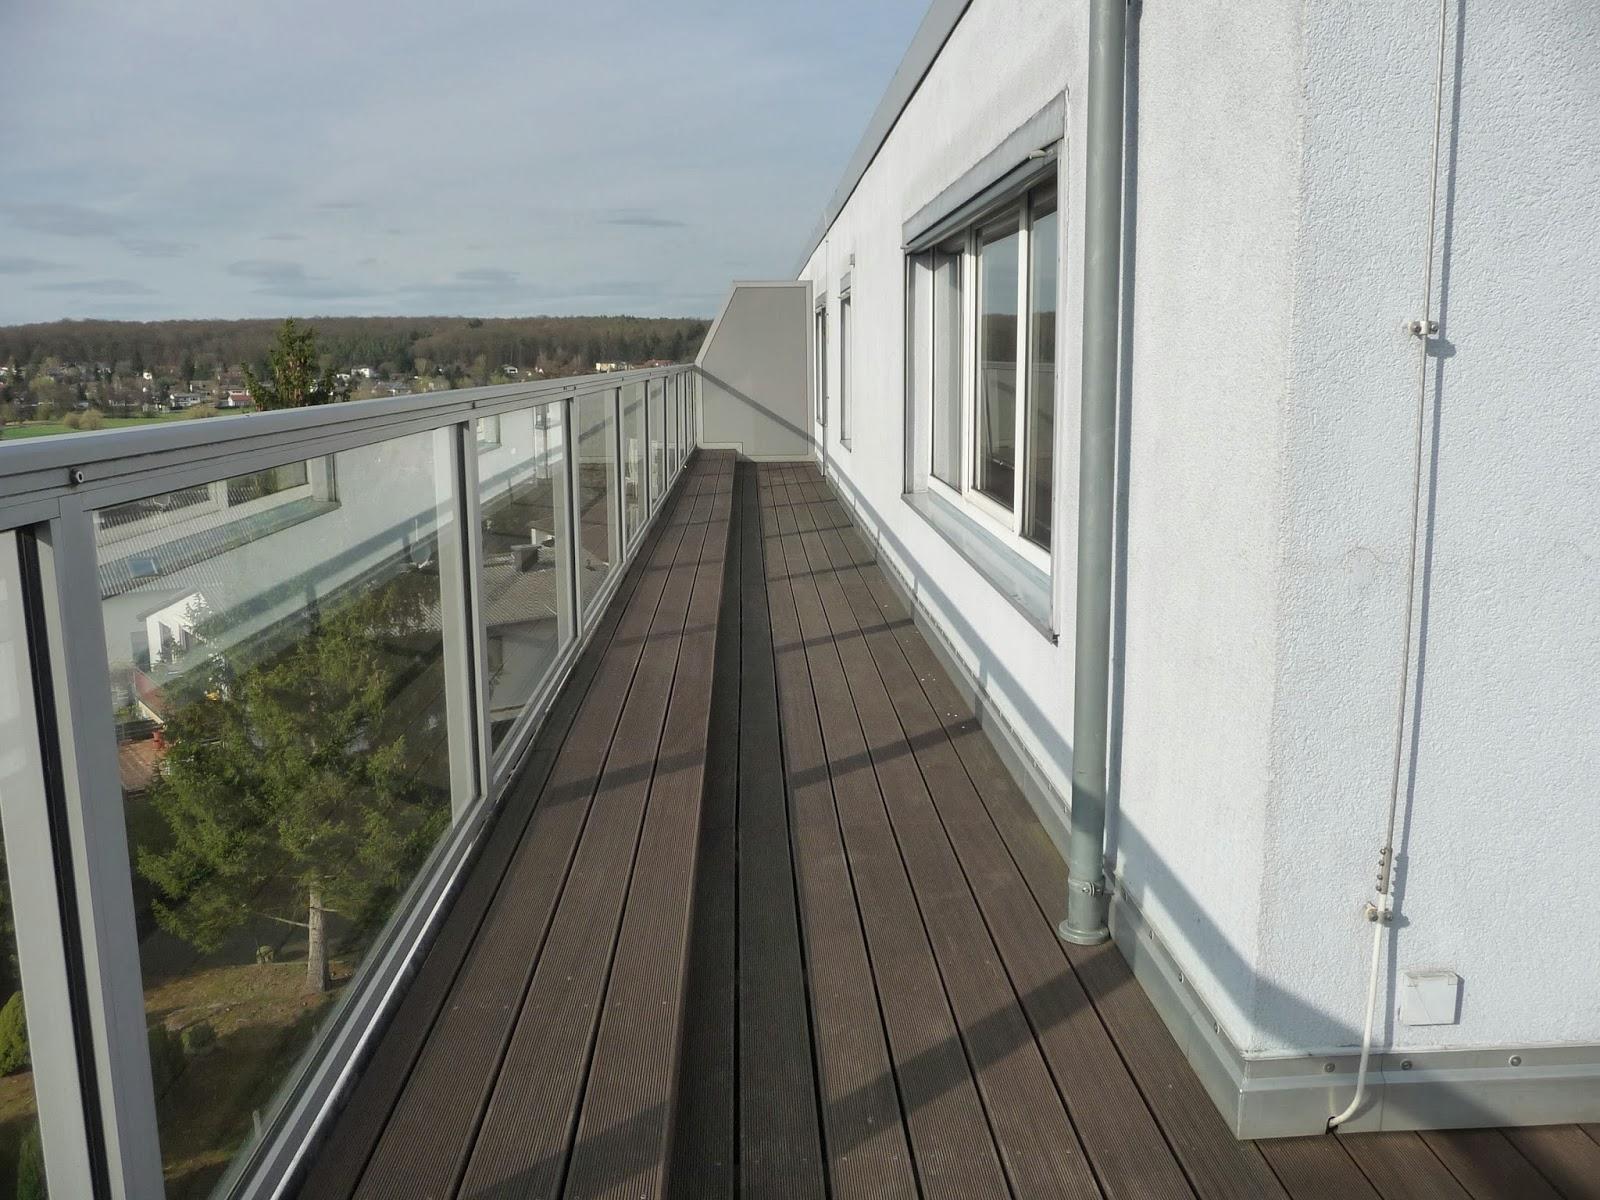 home company mietwohnzentrale gie en marburg wetzlar penthousewohnung in leihgestern mit. Black Bedroom Furniture Sets. Home Design Ideas